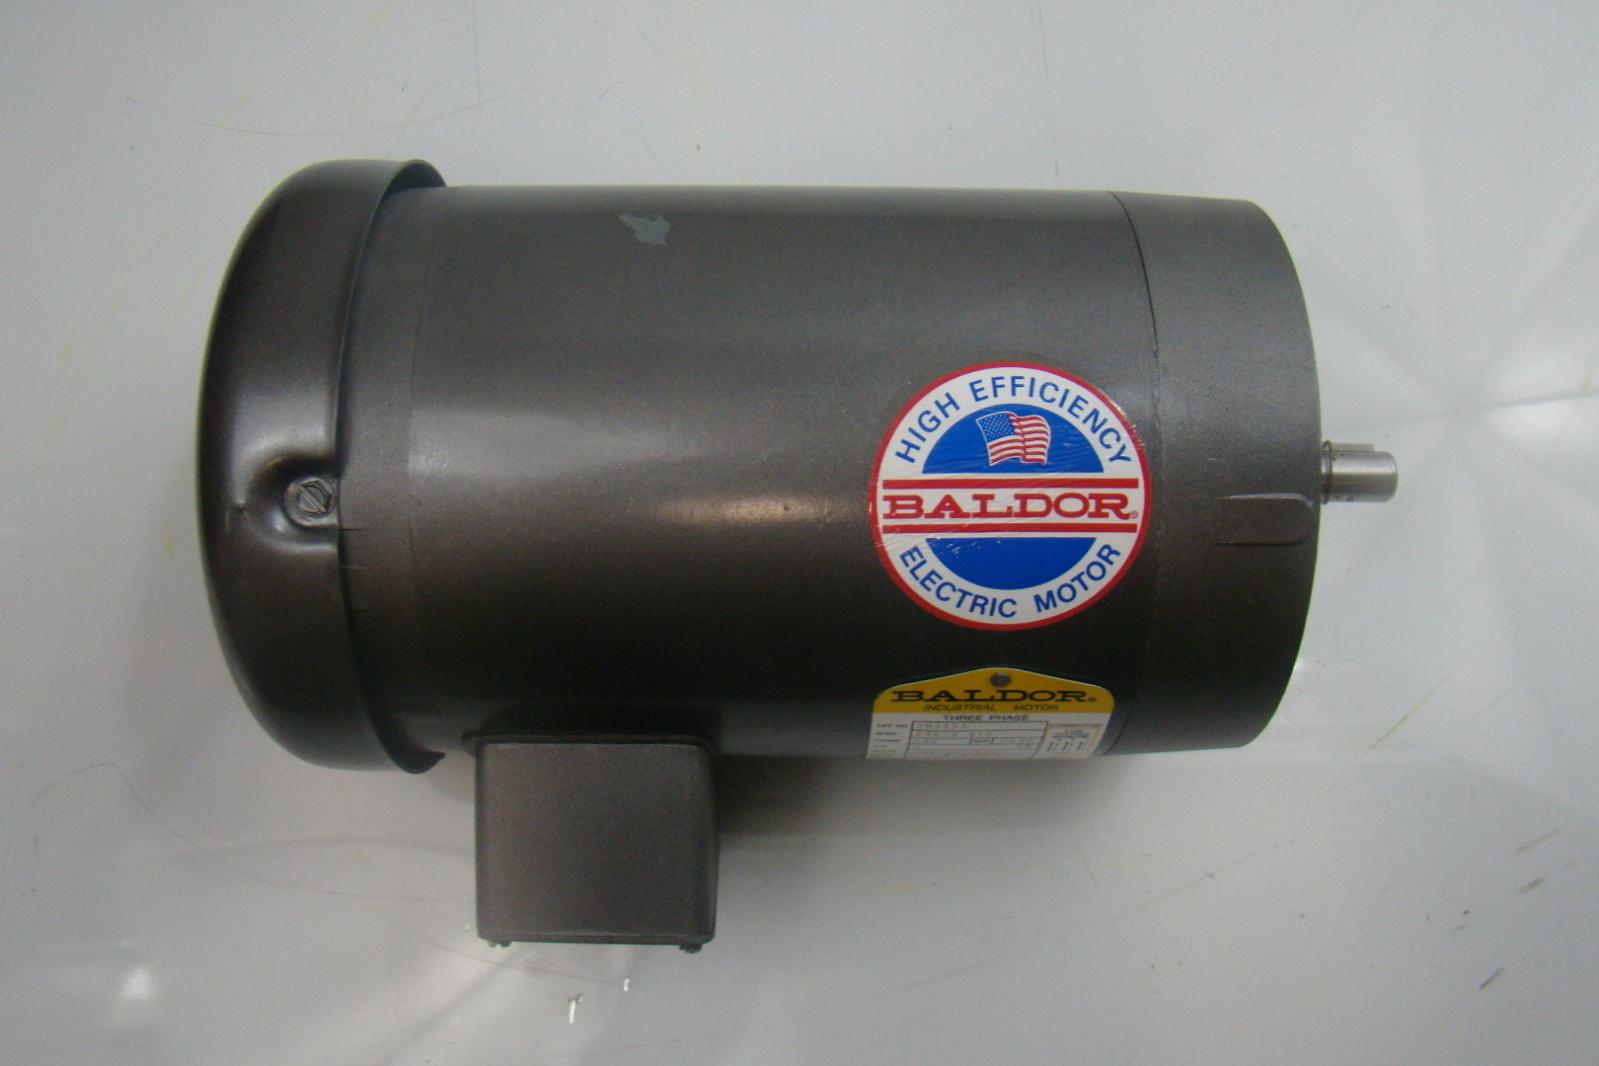 Baldor 2 Hp 3450 Rpm Electric Motor Vm3555 Ebay